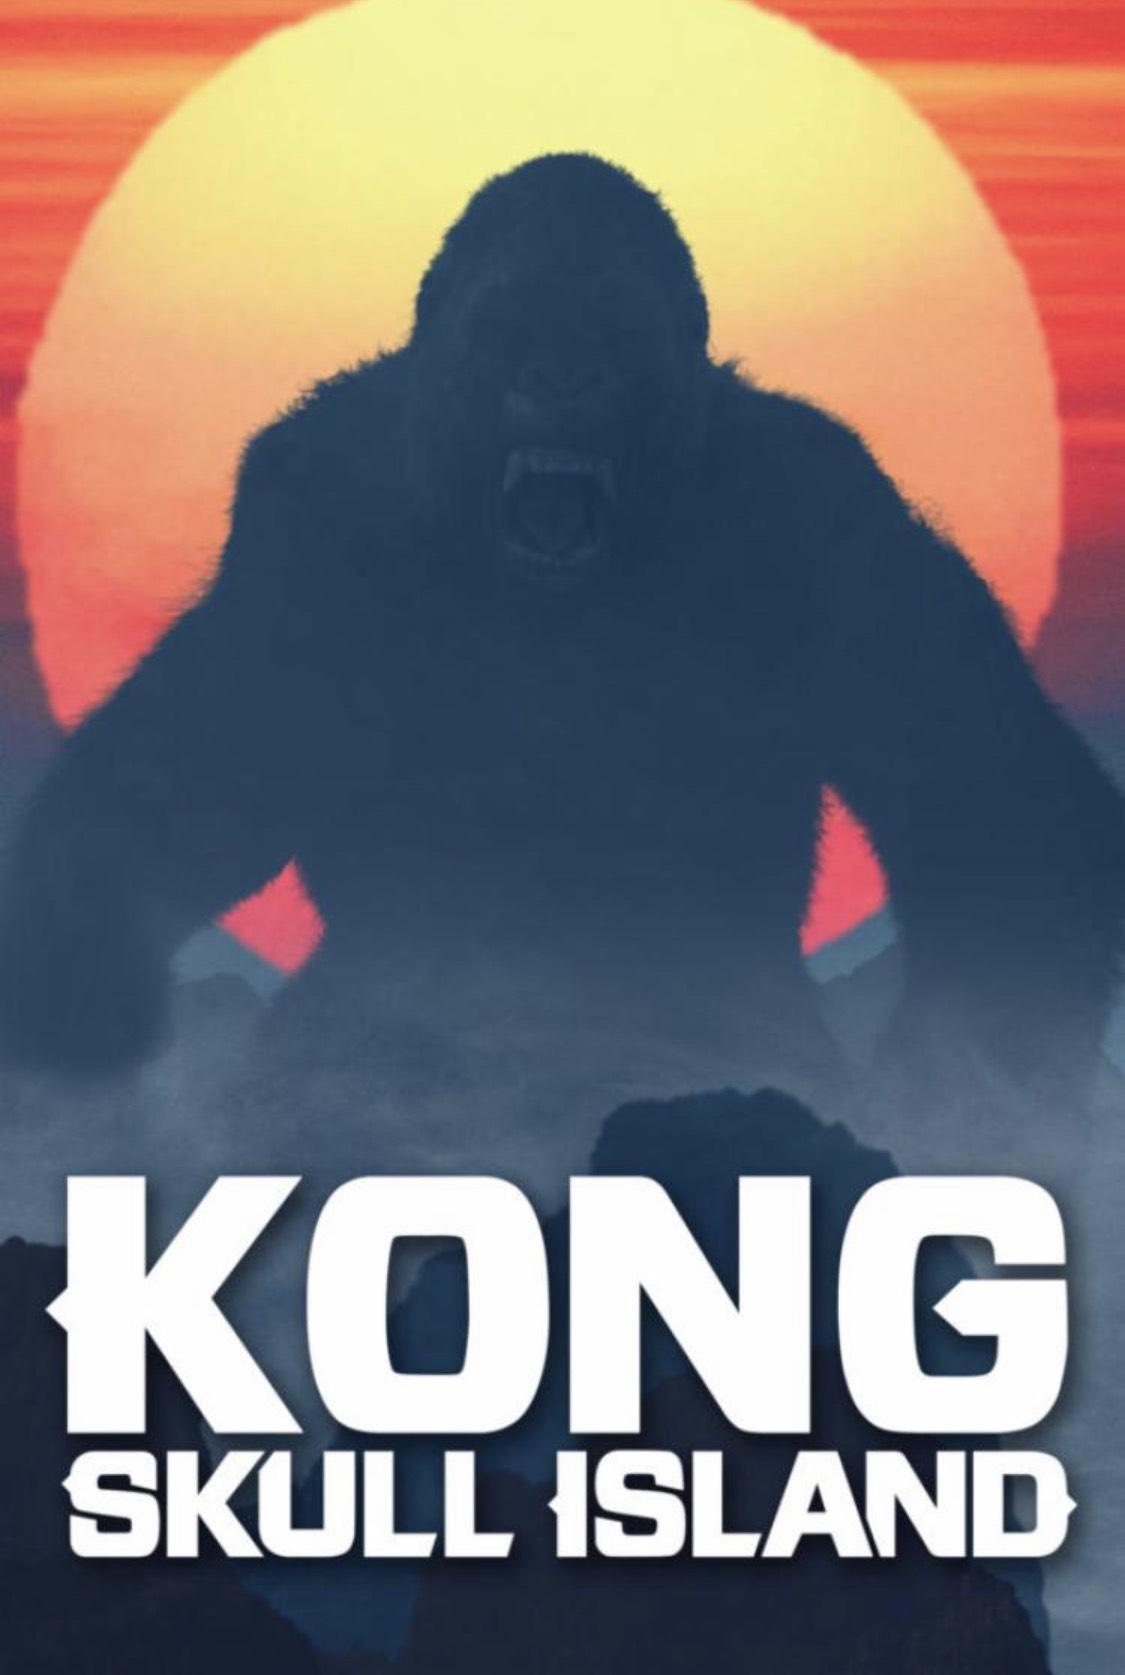 [iTunes] Kong Skull Island (4K, Dolby Vision, Dolby Atmos, OV) für 3,99€ zum Kauf